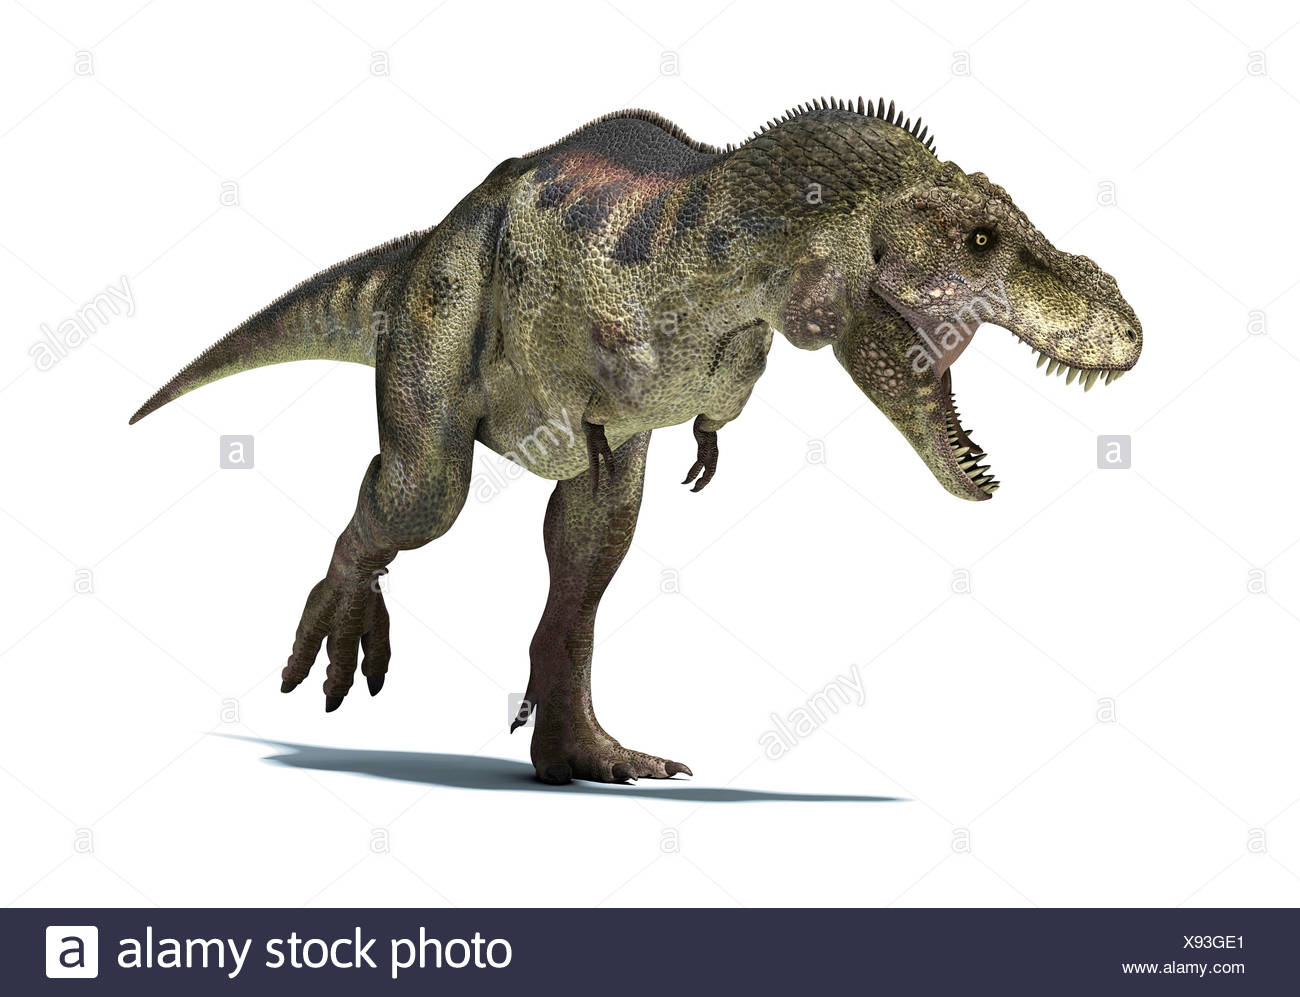 Tyrannosaurus rex dinosaur T rex was one of the largest carnivorous dinosaurs - Stock Image